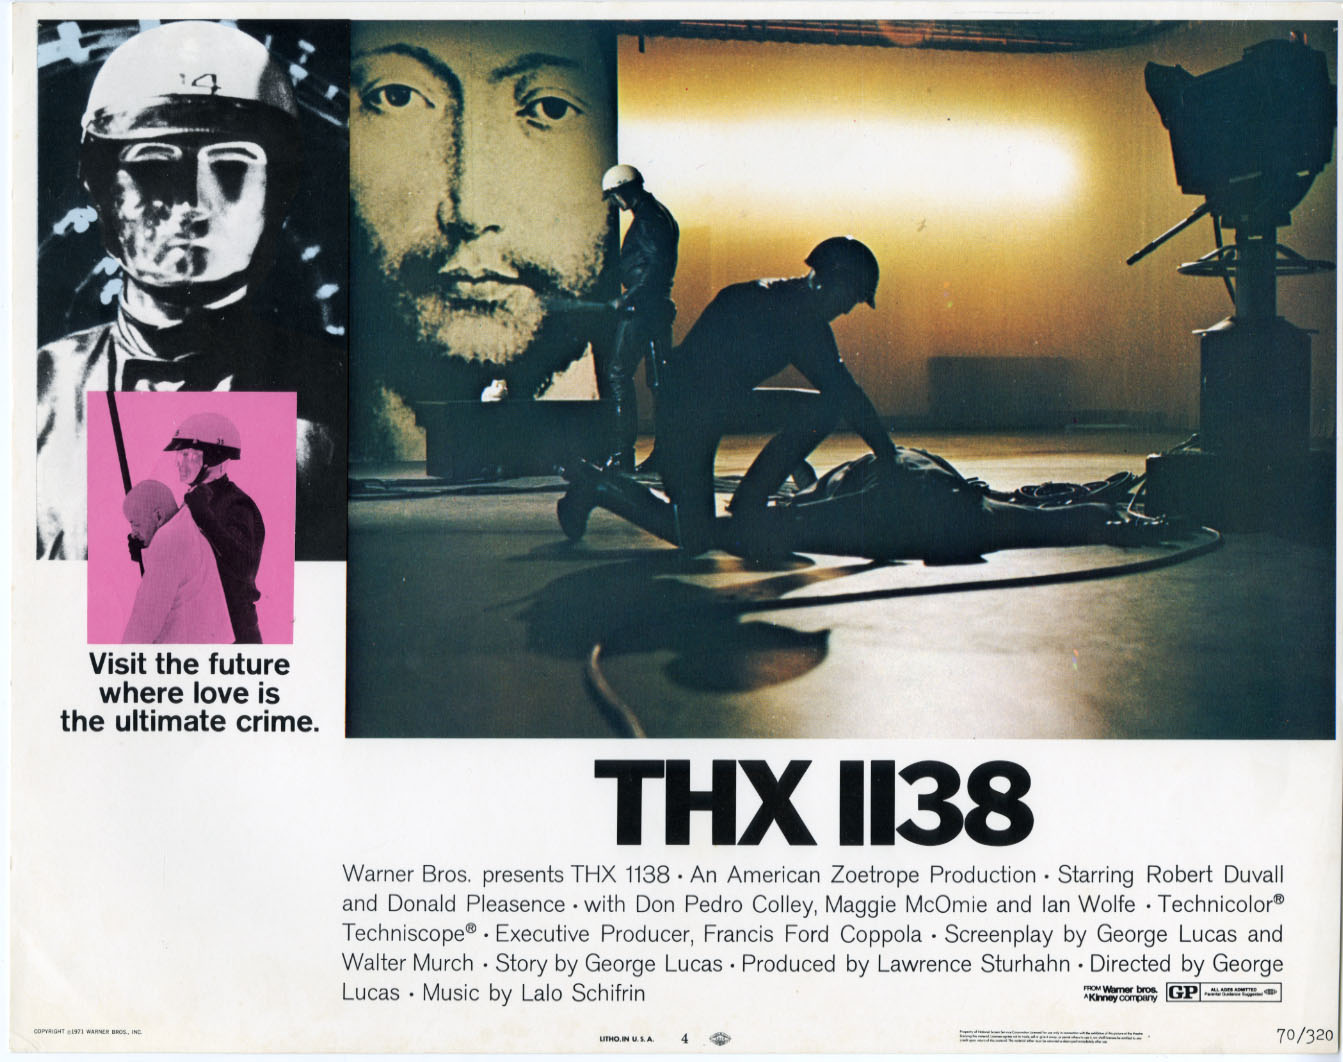 22718 THX 1138 THX 1138 Photography lobby cards design